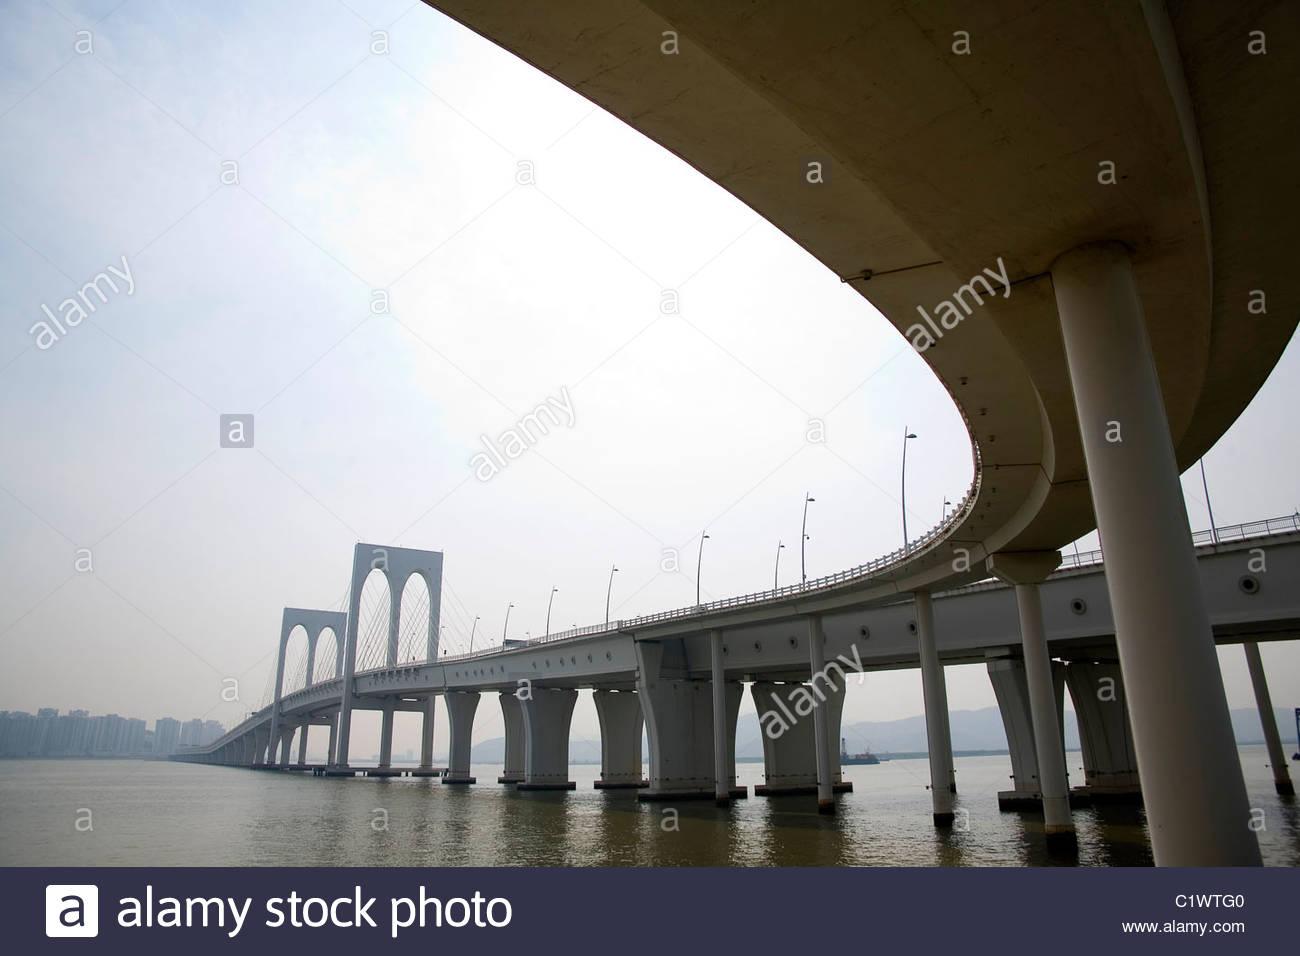 Macau, Sai Van Bridge, China - Stock Image